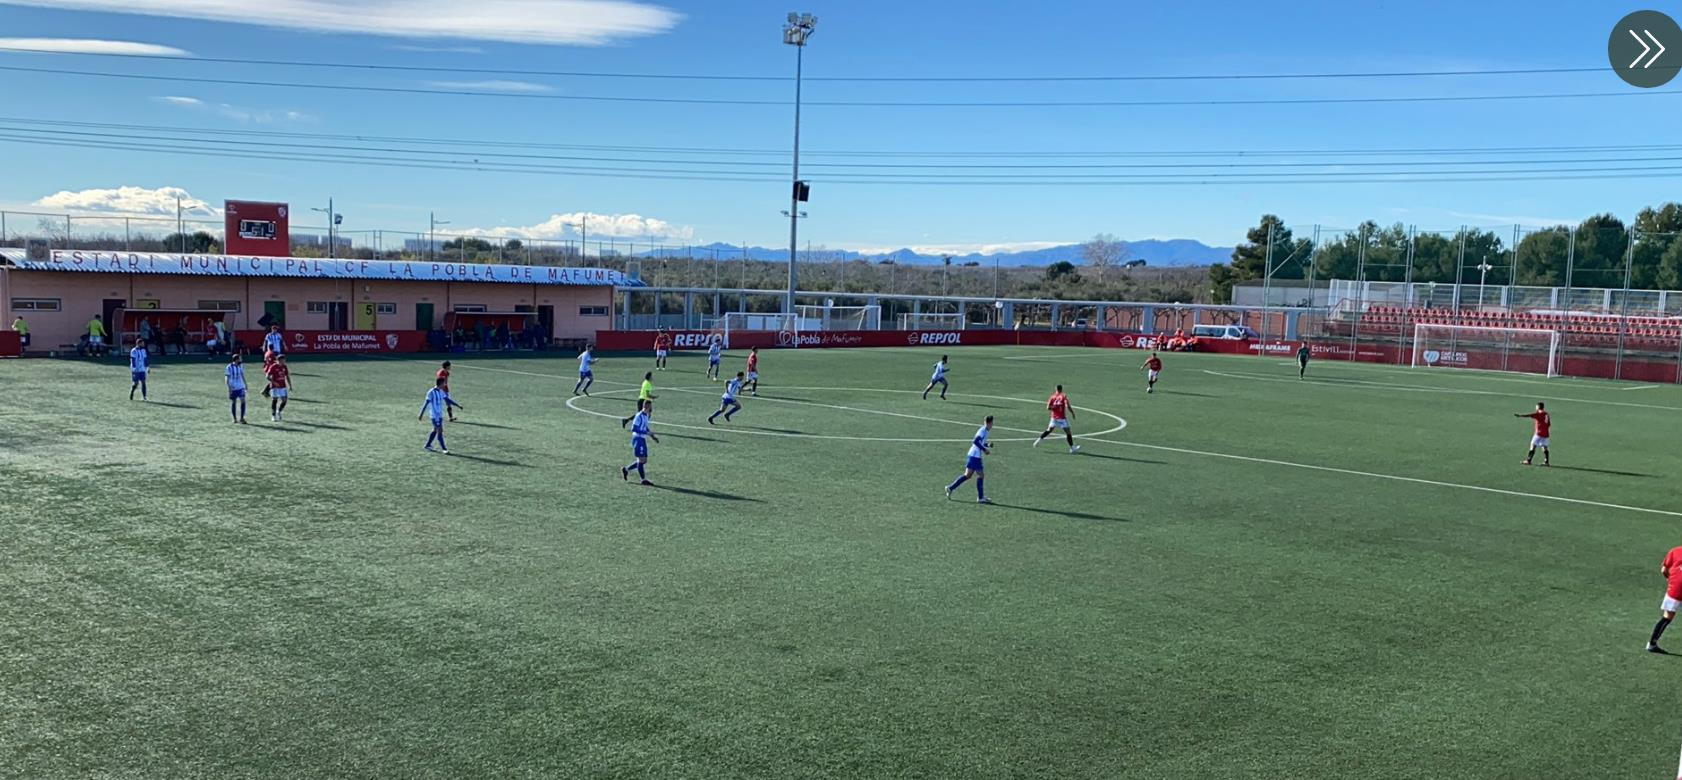 Empat a 1 entre el CF Pobla de Mafumet i el Santfeliuenc FC